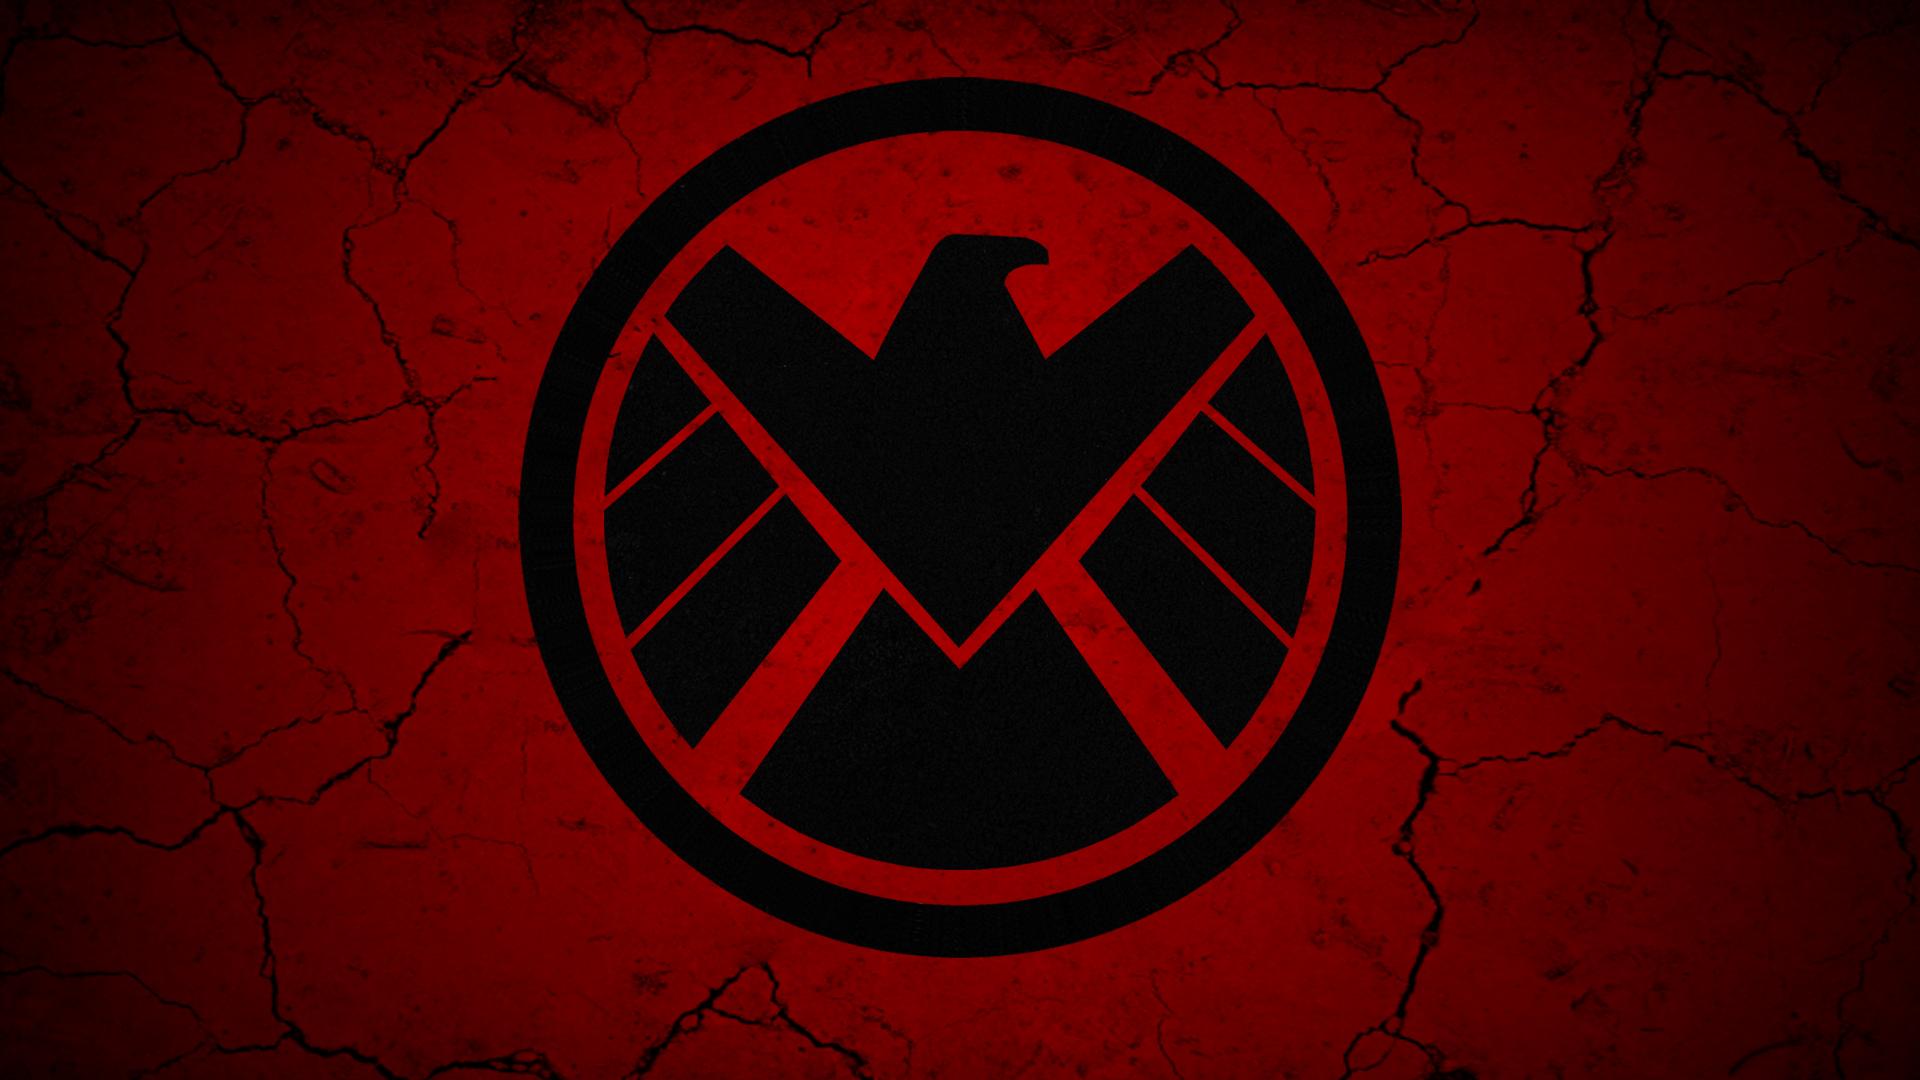 42 Marvel Agents Of Shield Wallpaper On Wallpapersafari